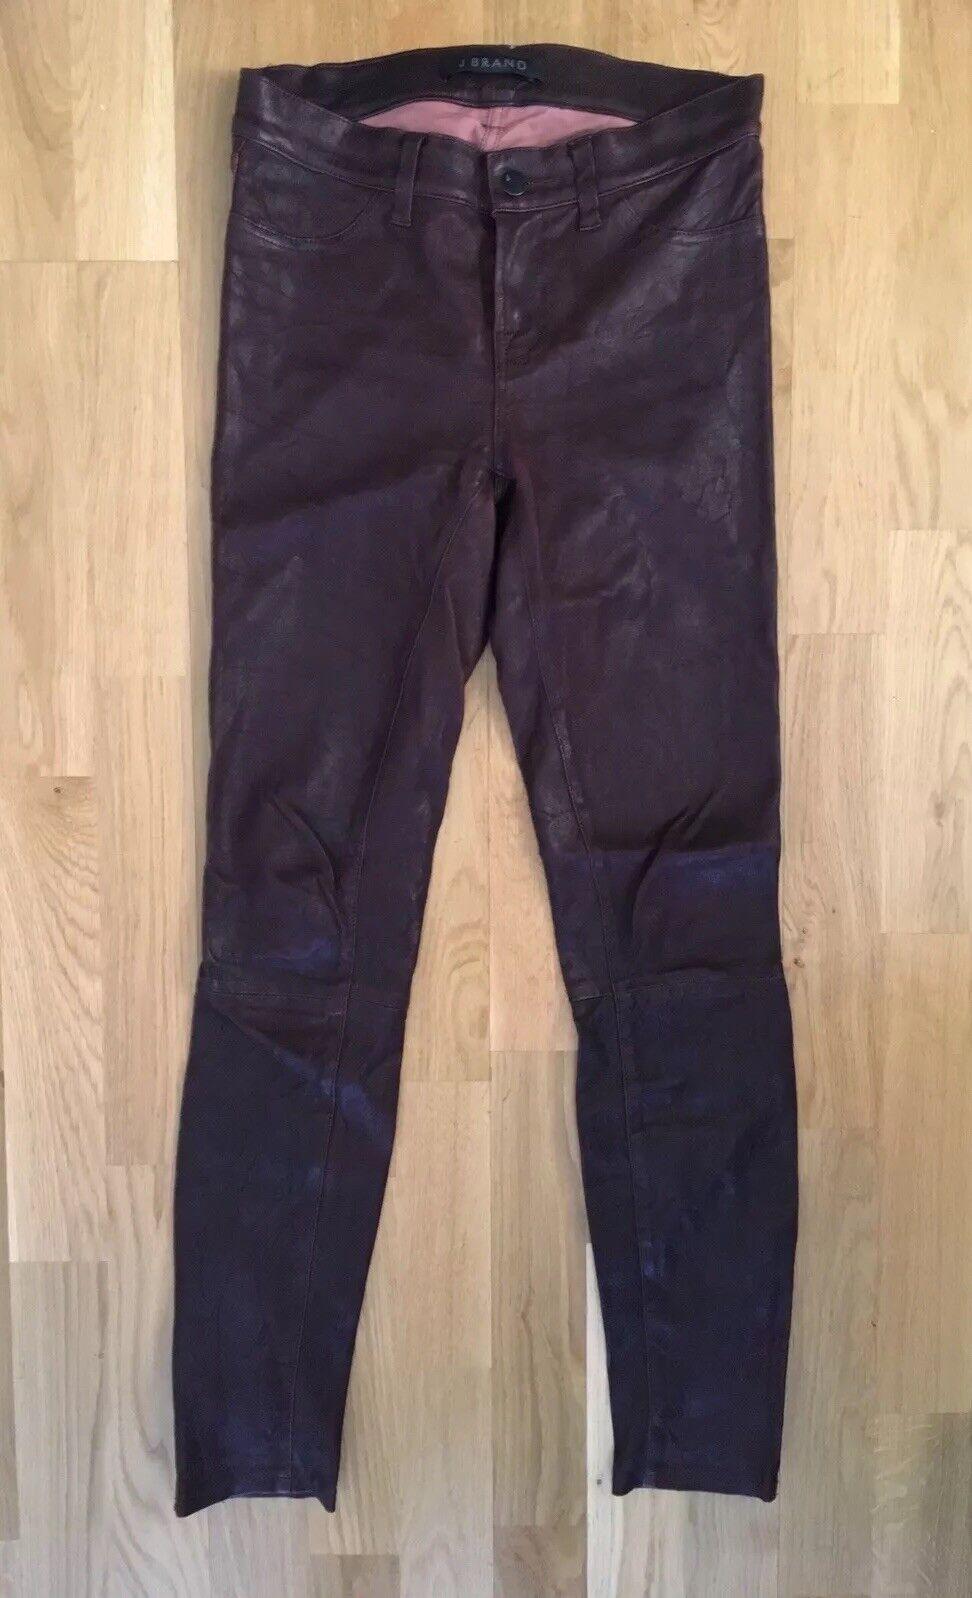 J Brand Oxblood Dark Red Leather Pants Size XS